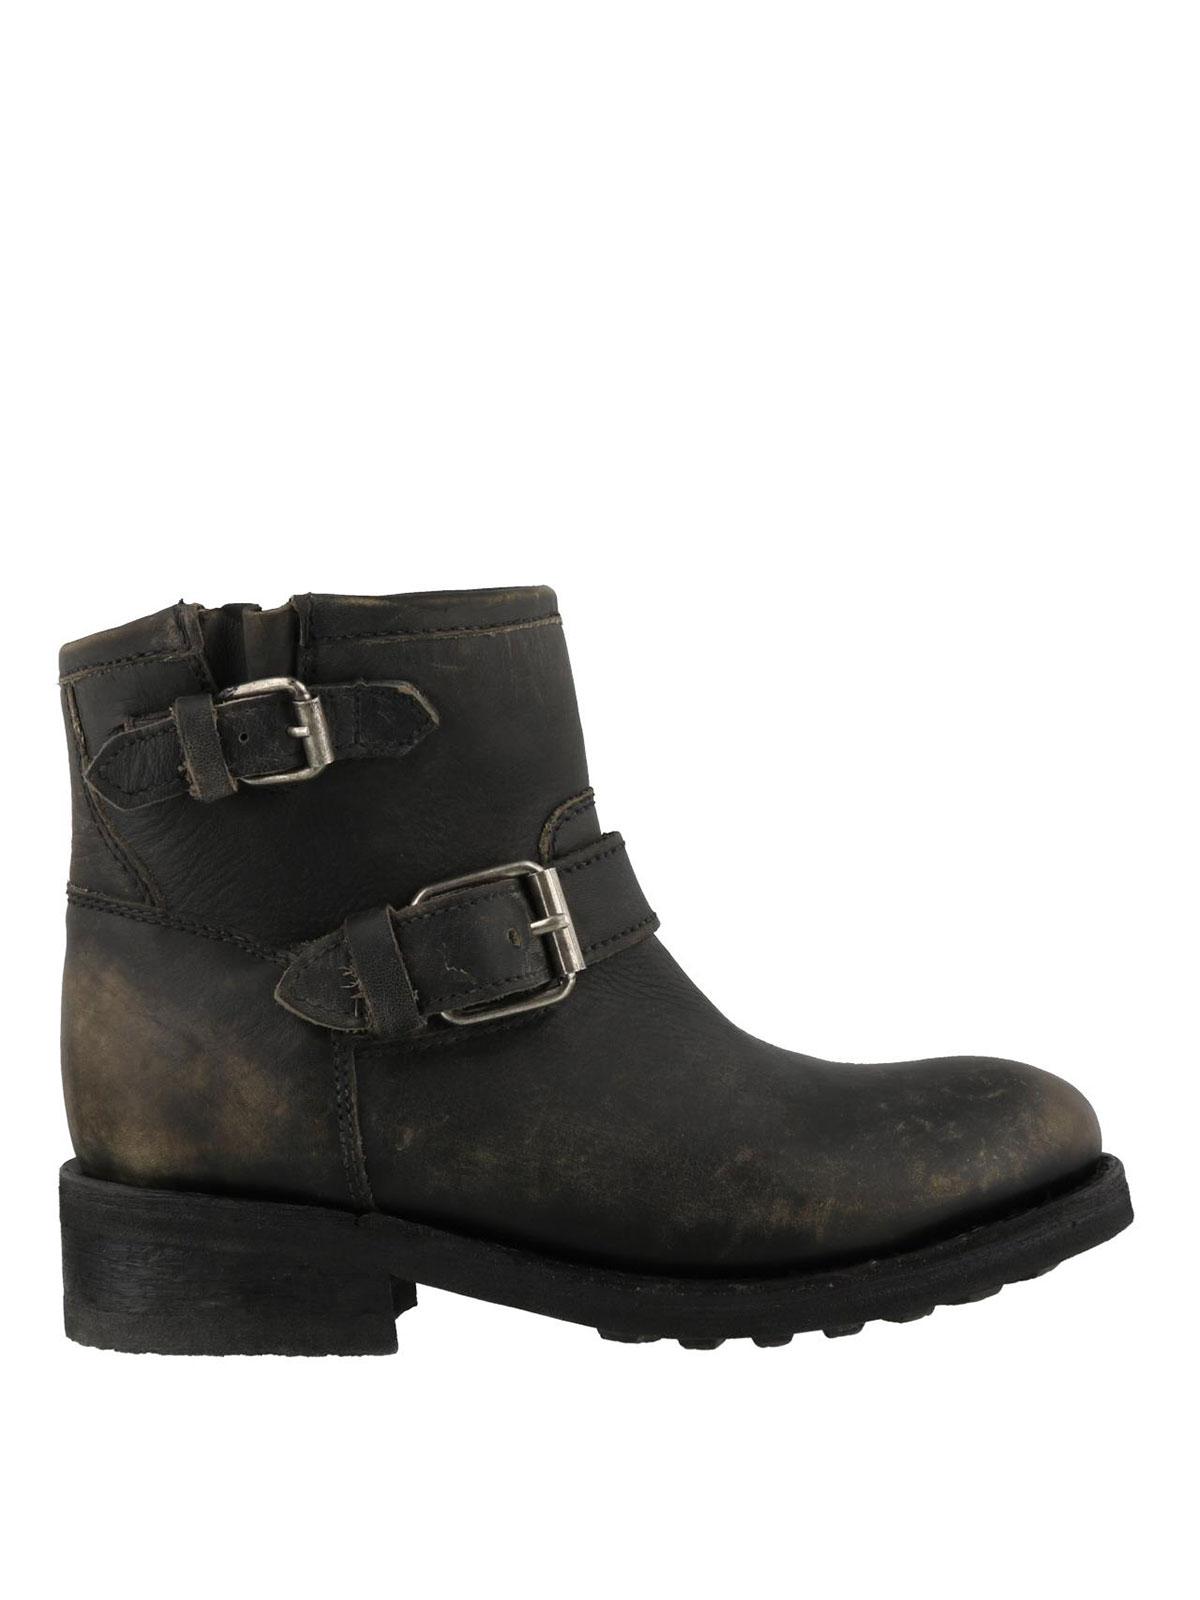 73e80123584aa2 Ash - Trick ankle boots - Bottines - TRICK BLACK   iKRIX.com